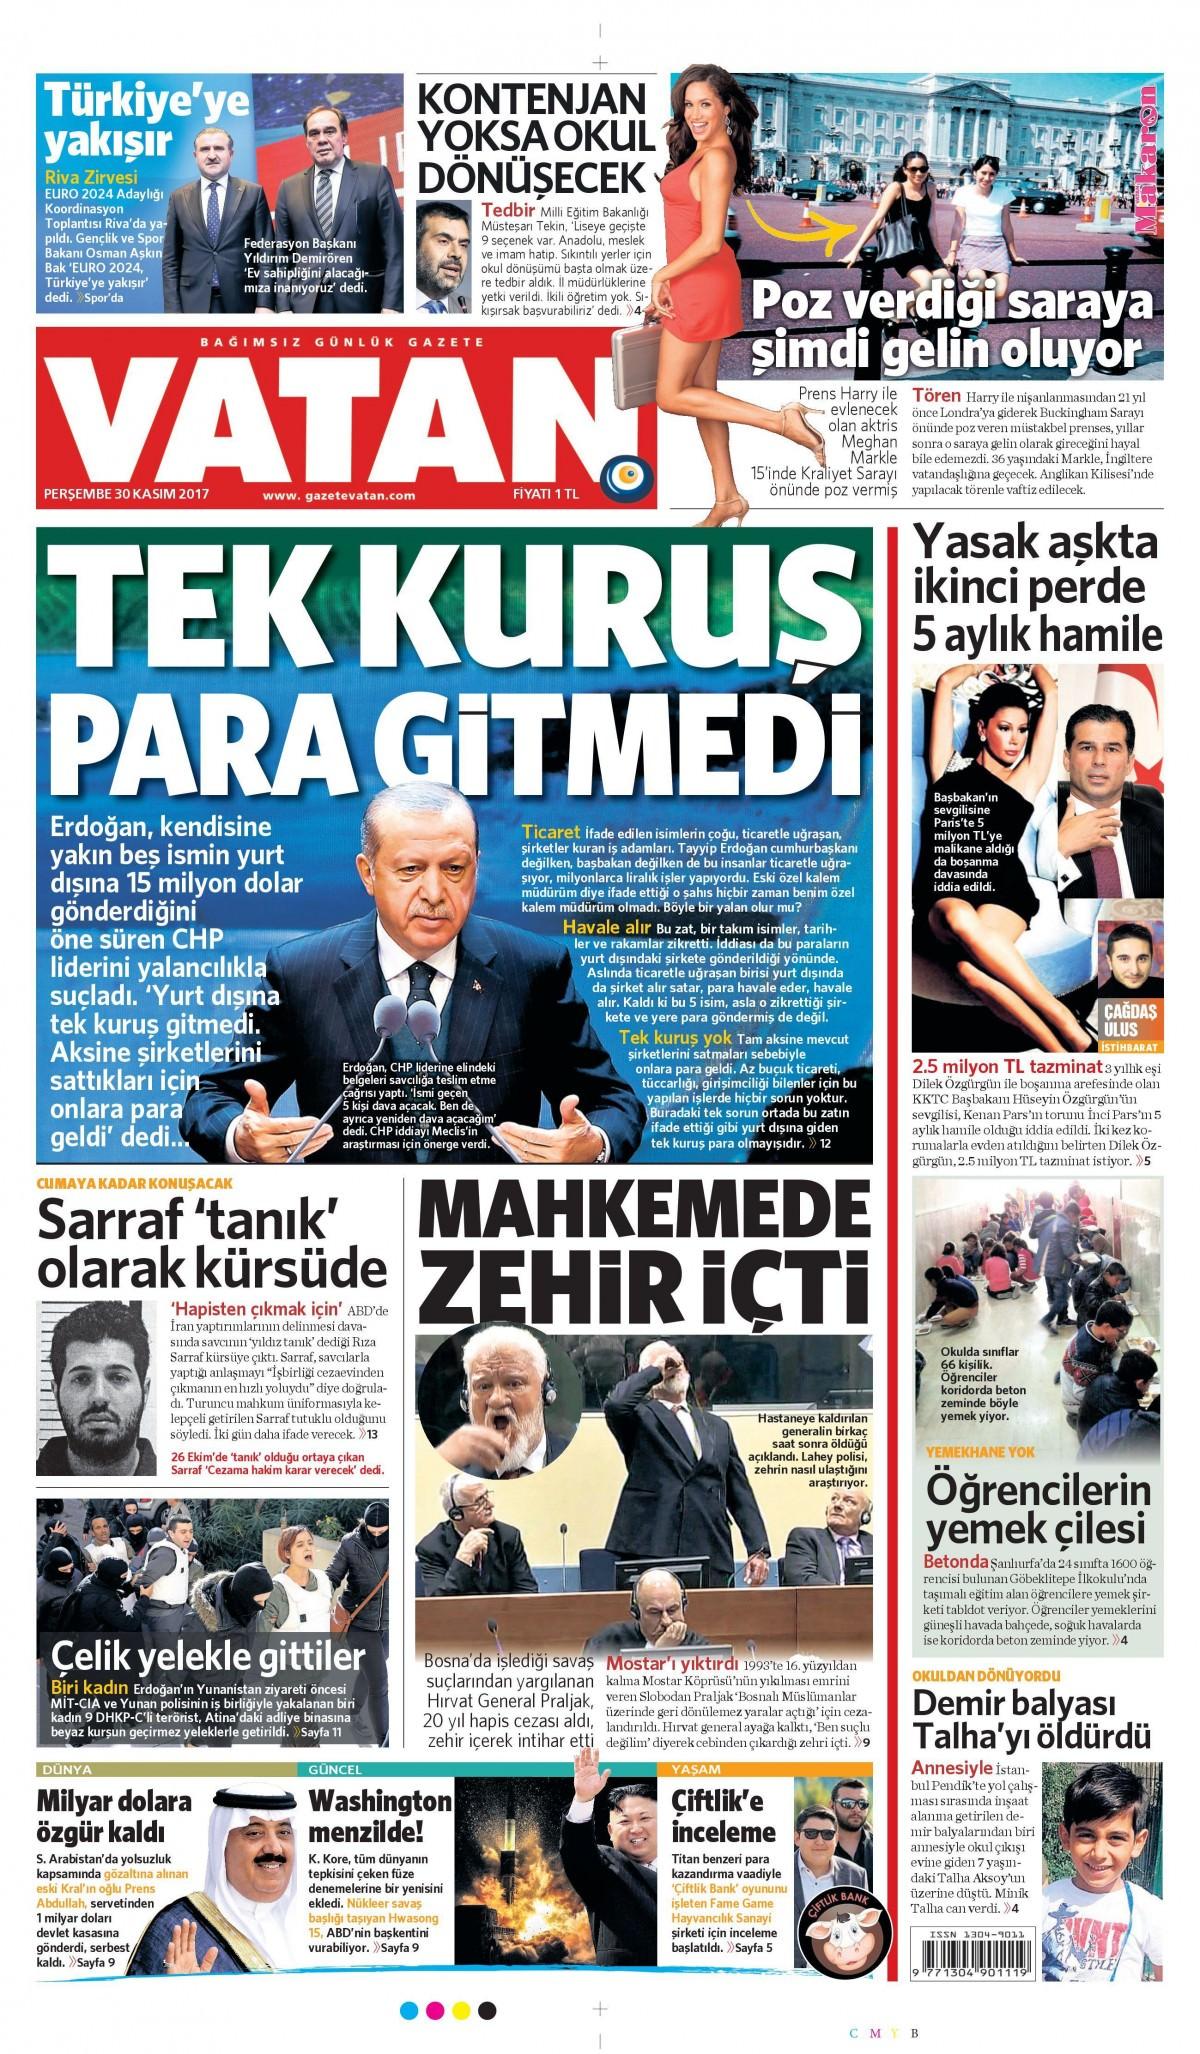 Gazeteler bugün hangi manşeti attı 2